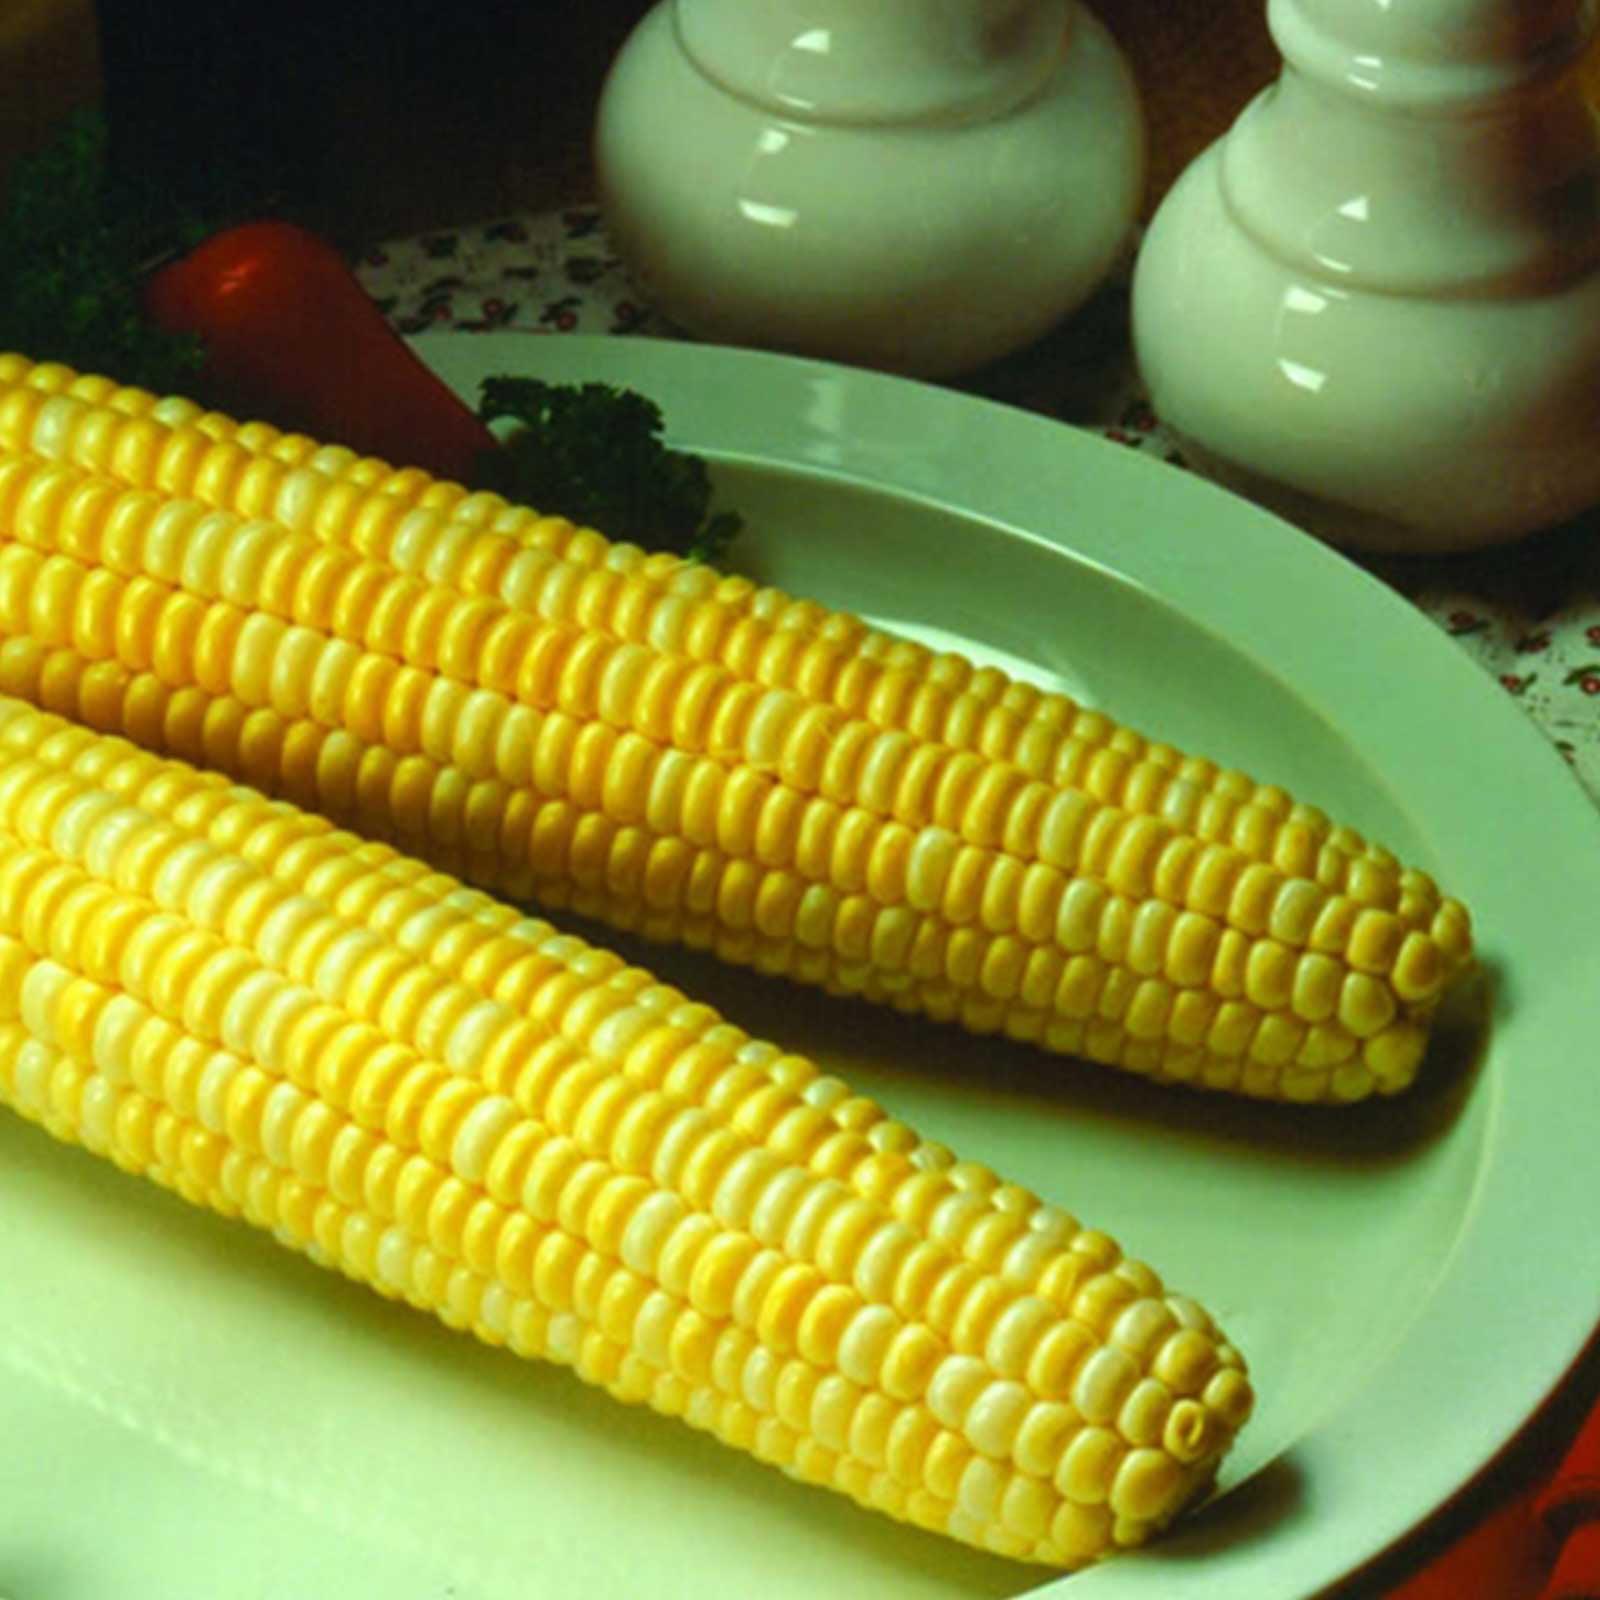 Image of Honey & Cream Hybrid Corn Garden Seeds (Treated) - 1 Lb - Non-GMO, Sugary Enhanced, Yellow & White Sweet Corn - Vegetetable Gardening